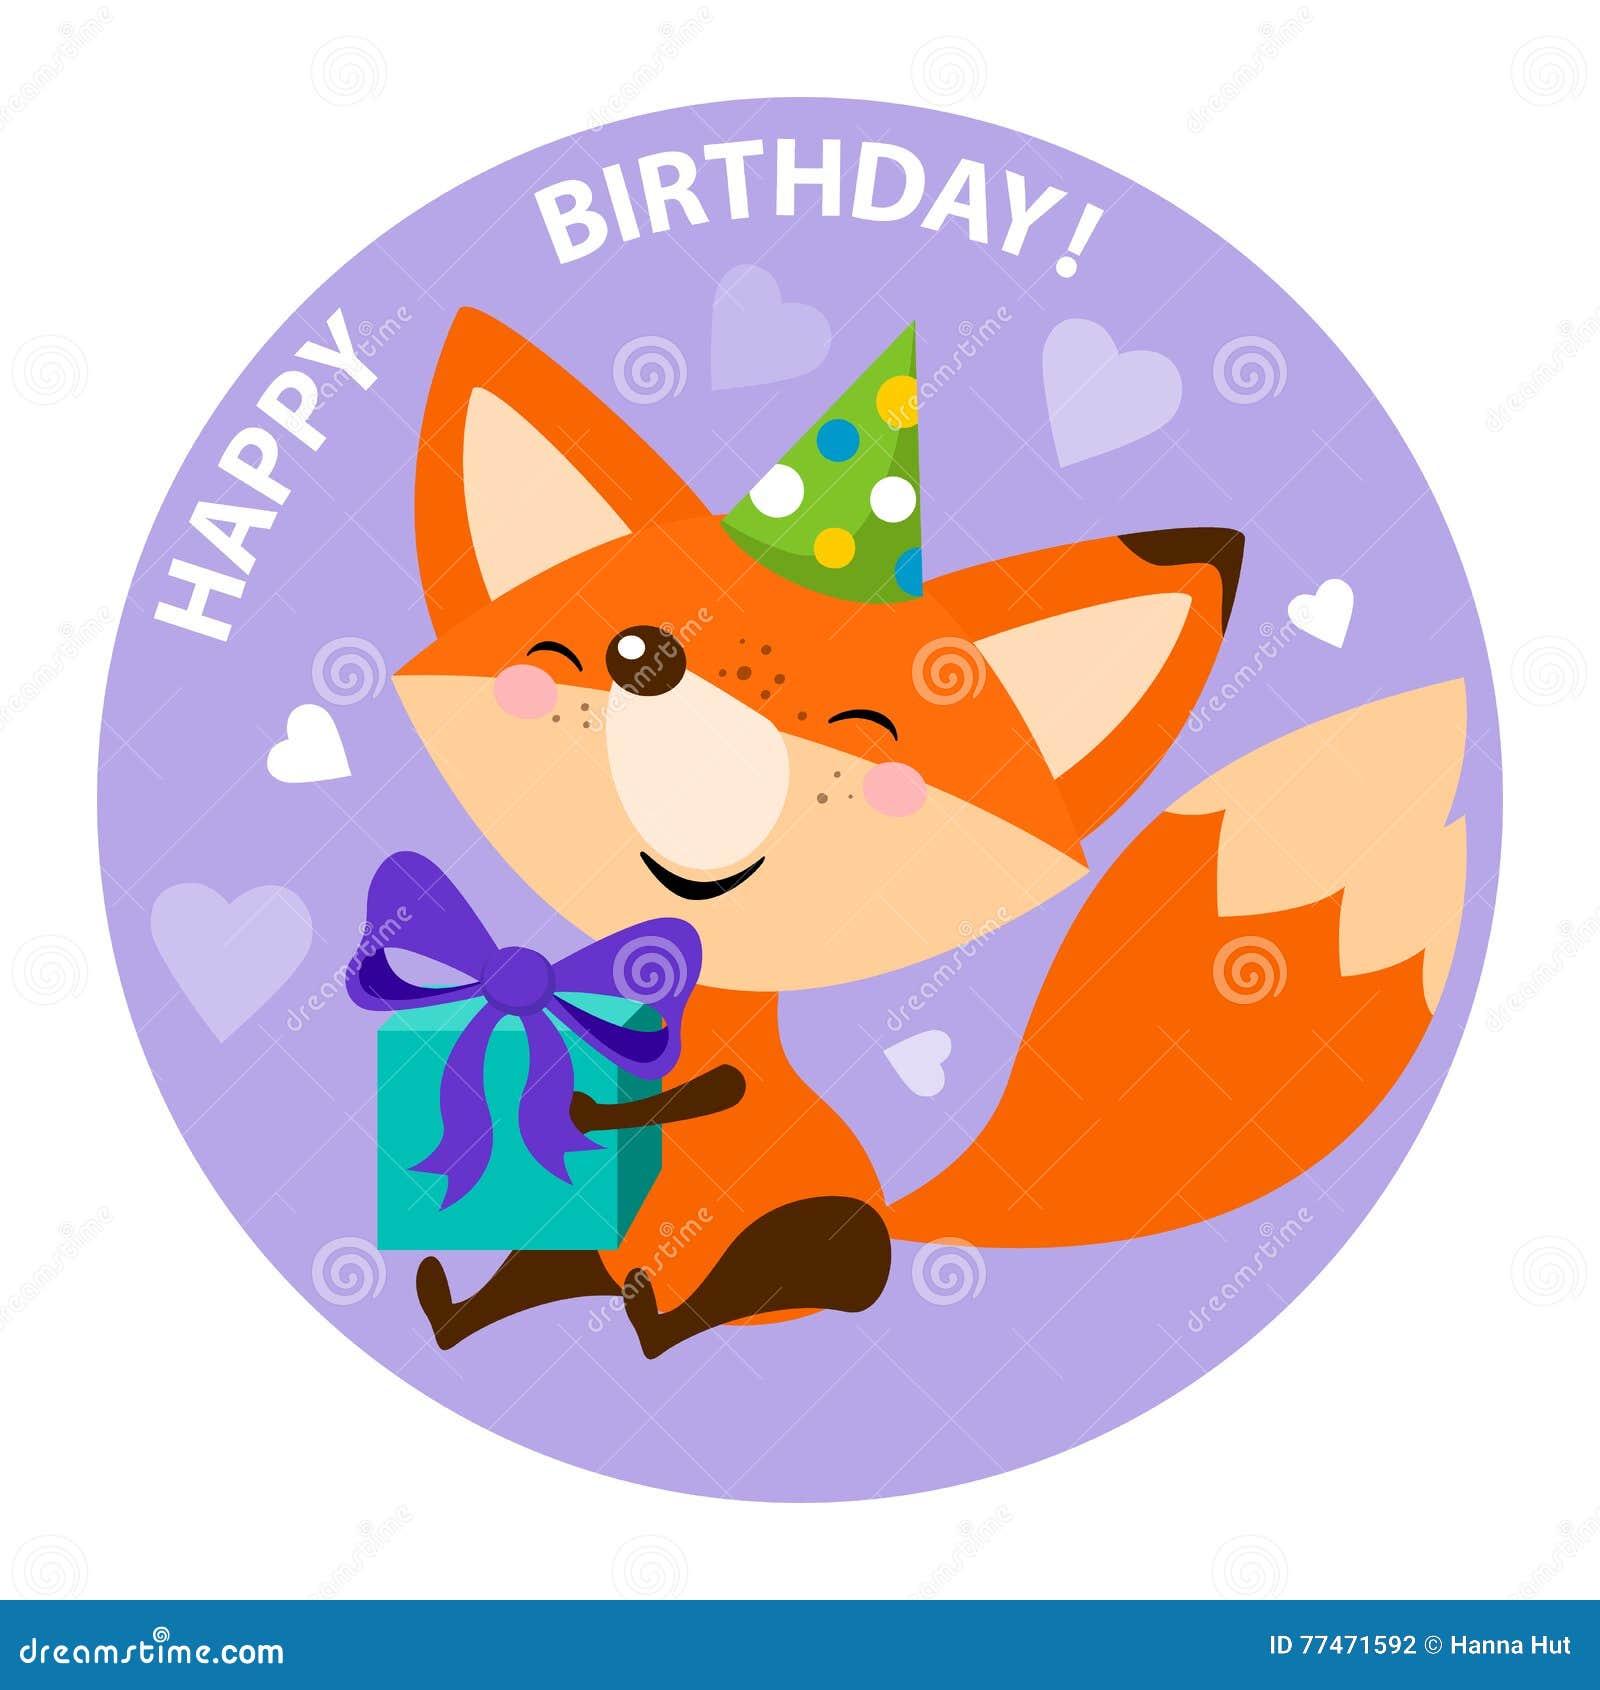 Happy birthday card design with cute cartoon fox stock vector happy birthday card design stock photography kristyandbryce Image collections